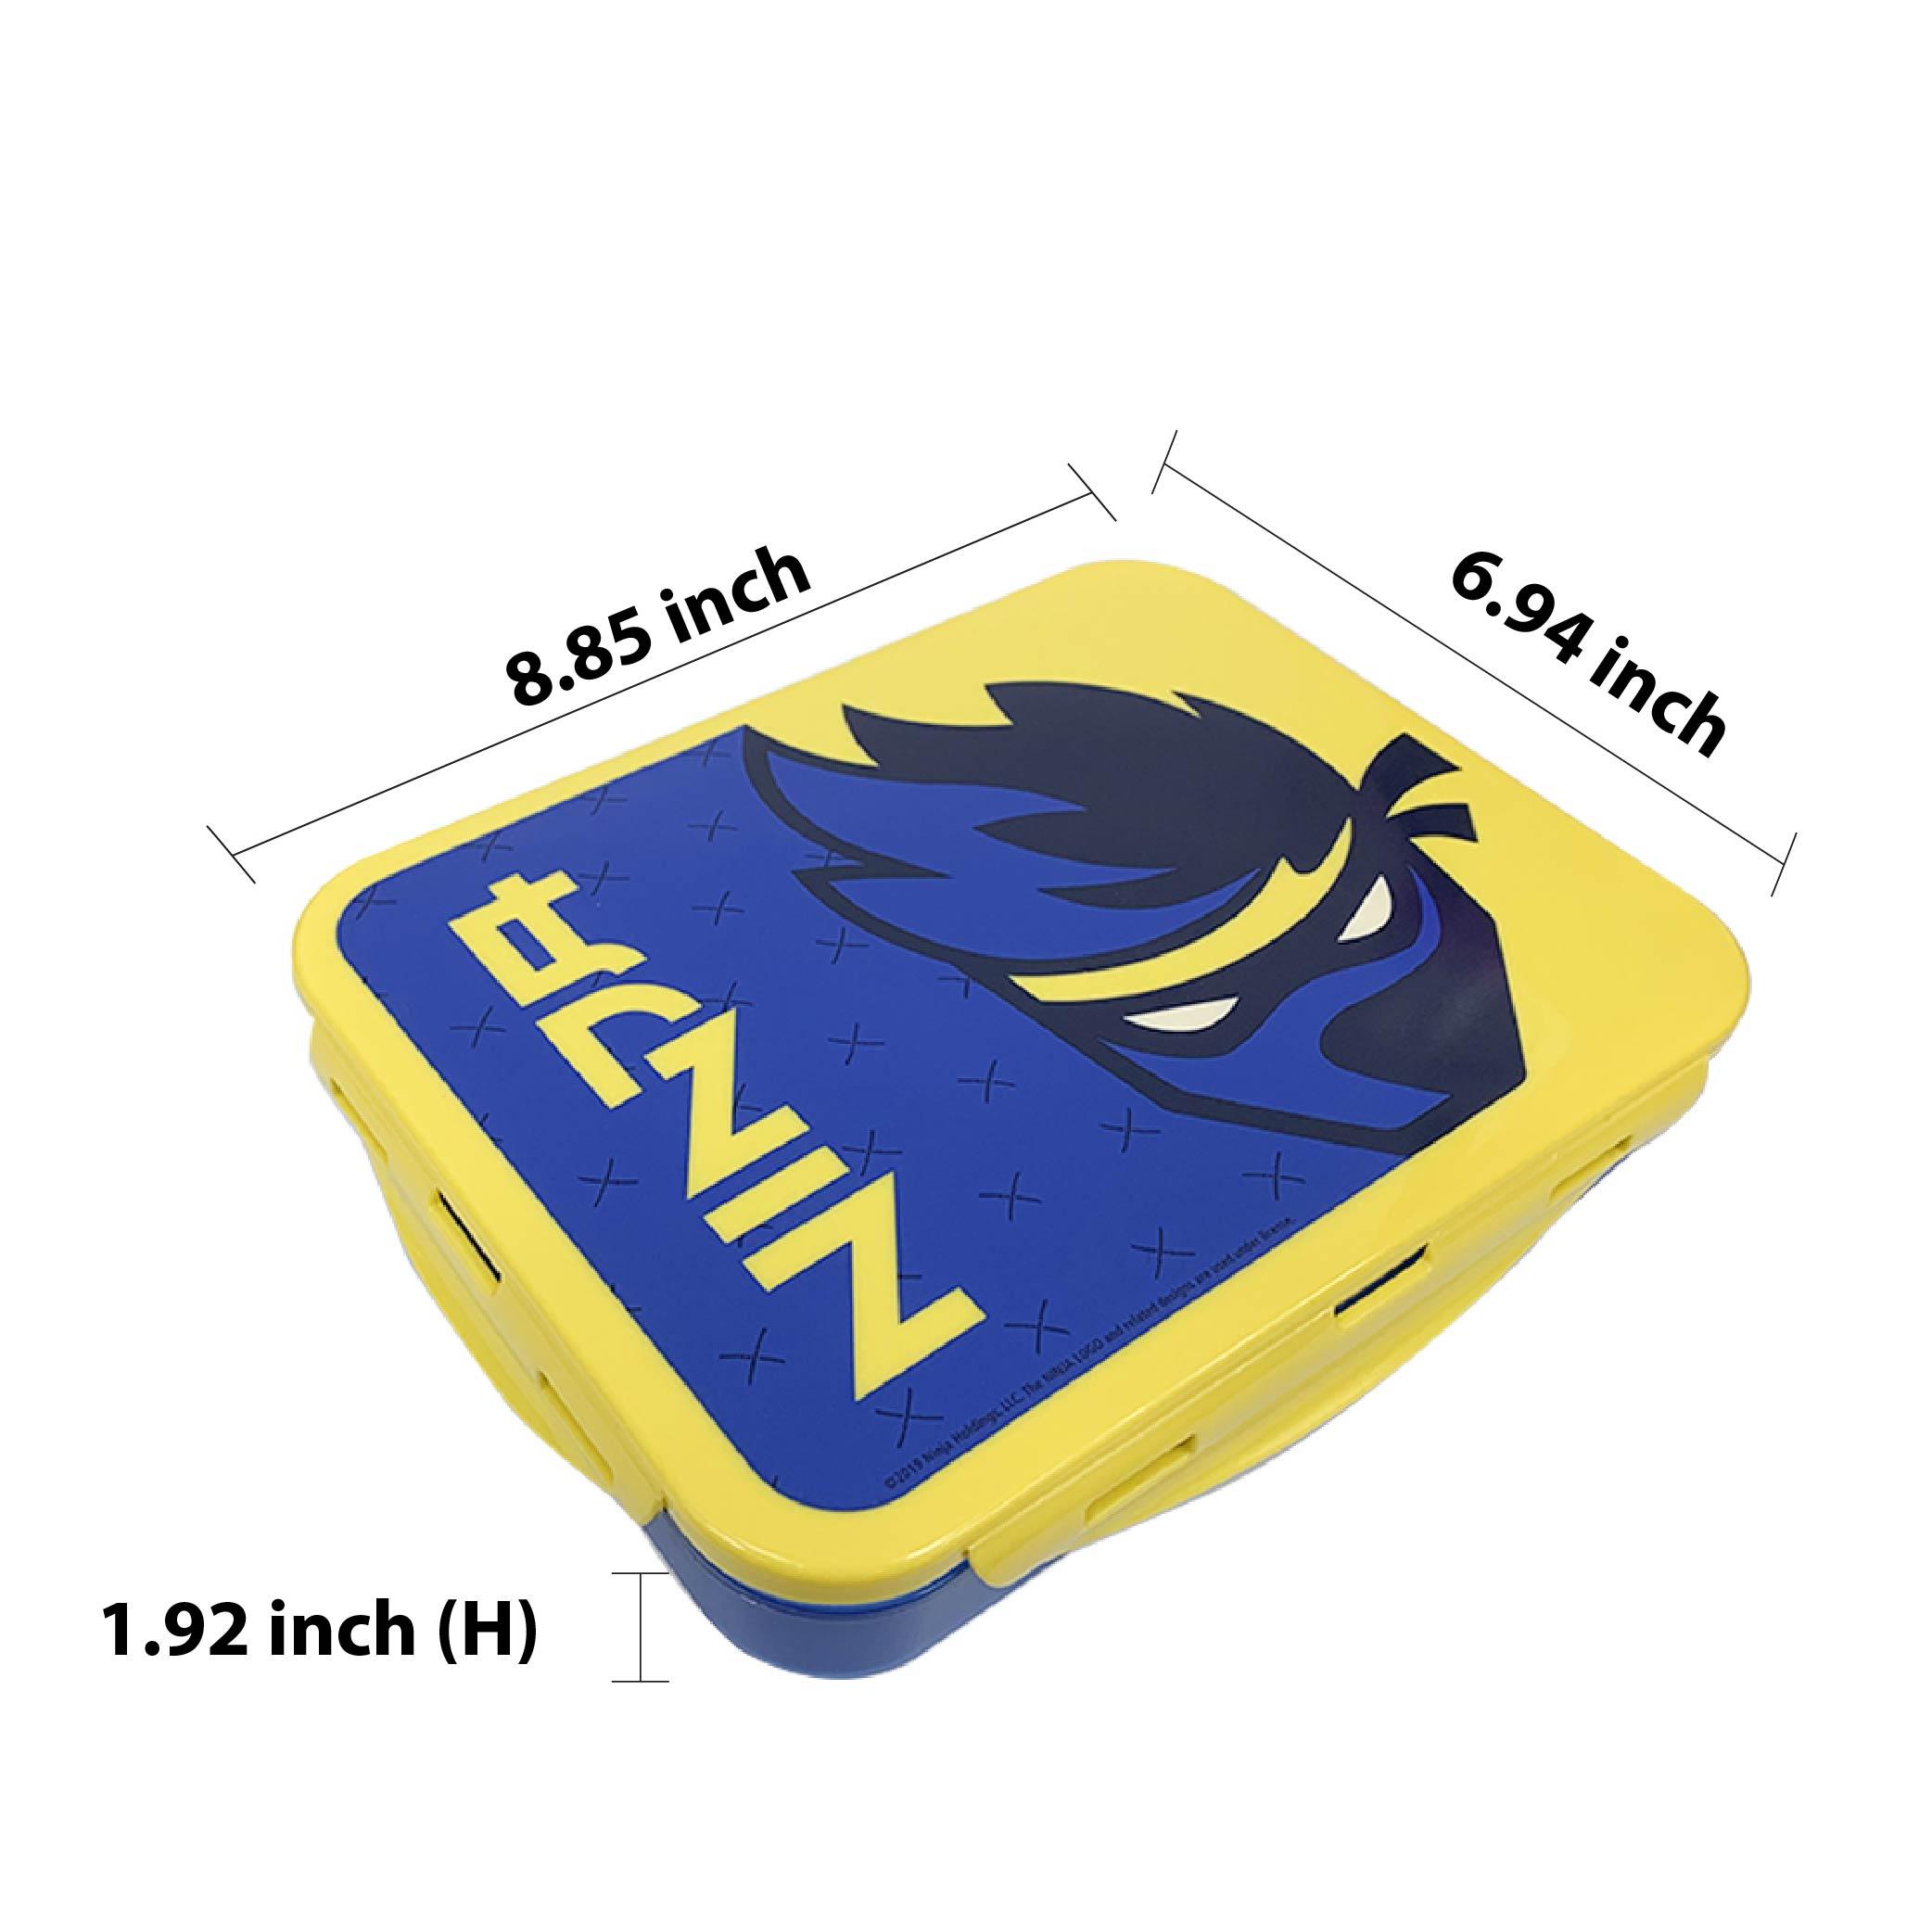 Ninja 3-section Reusable Bento Boxes, Video Games, 2-piece set slideshow image 2